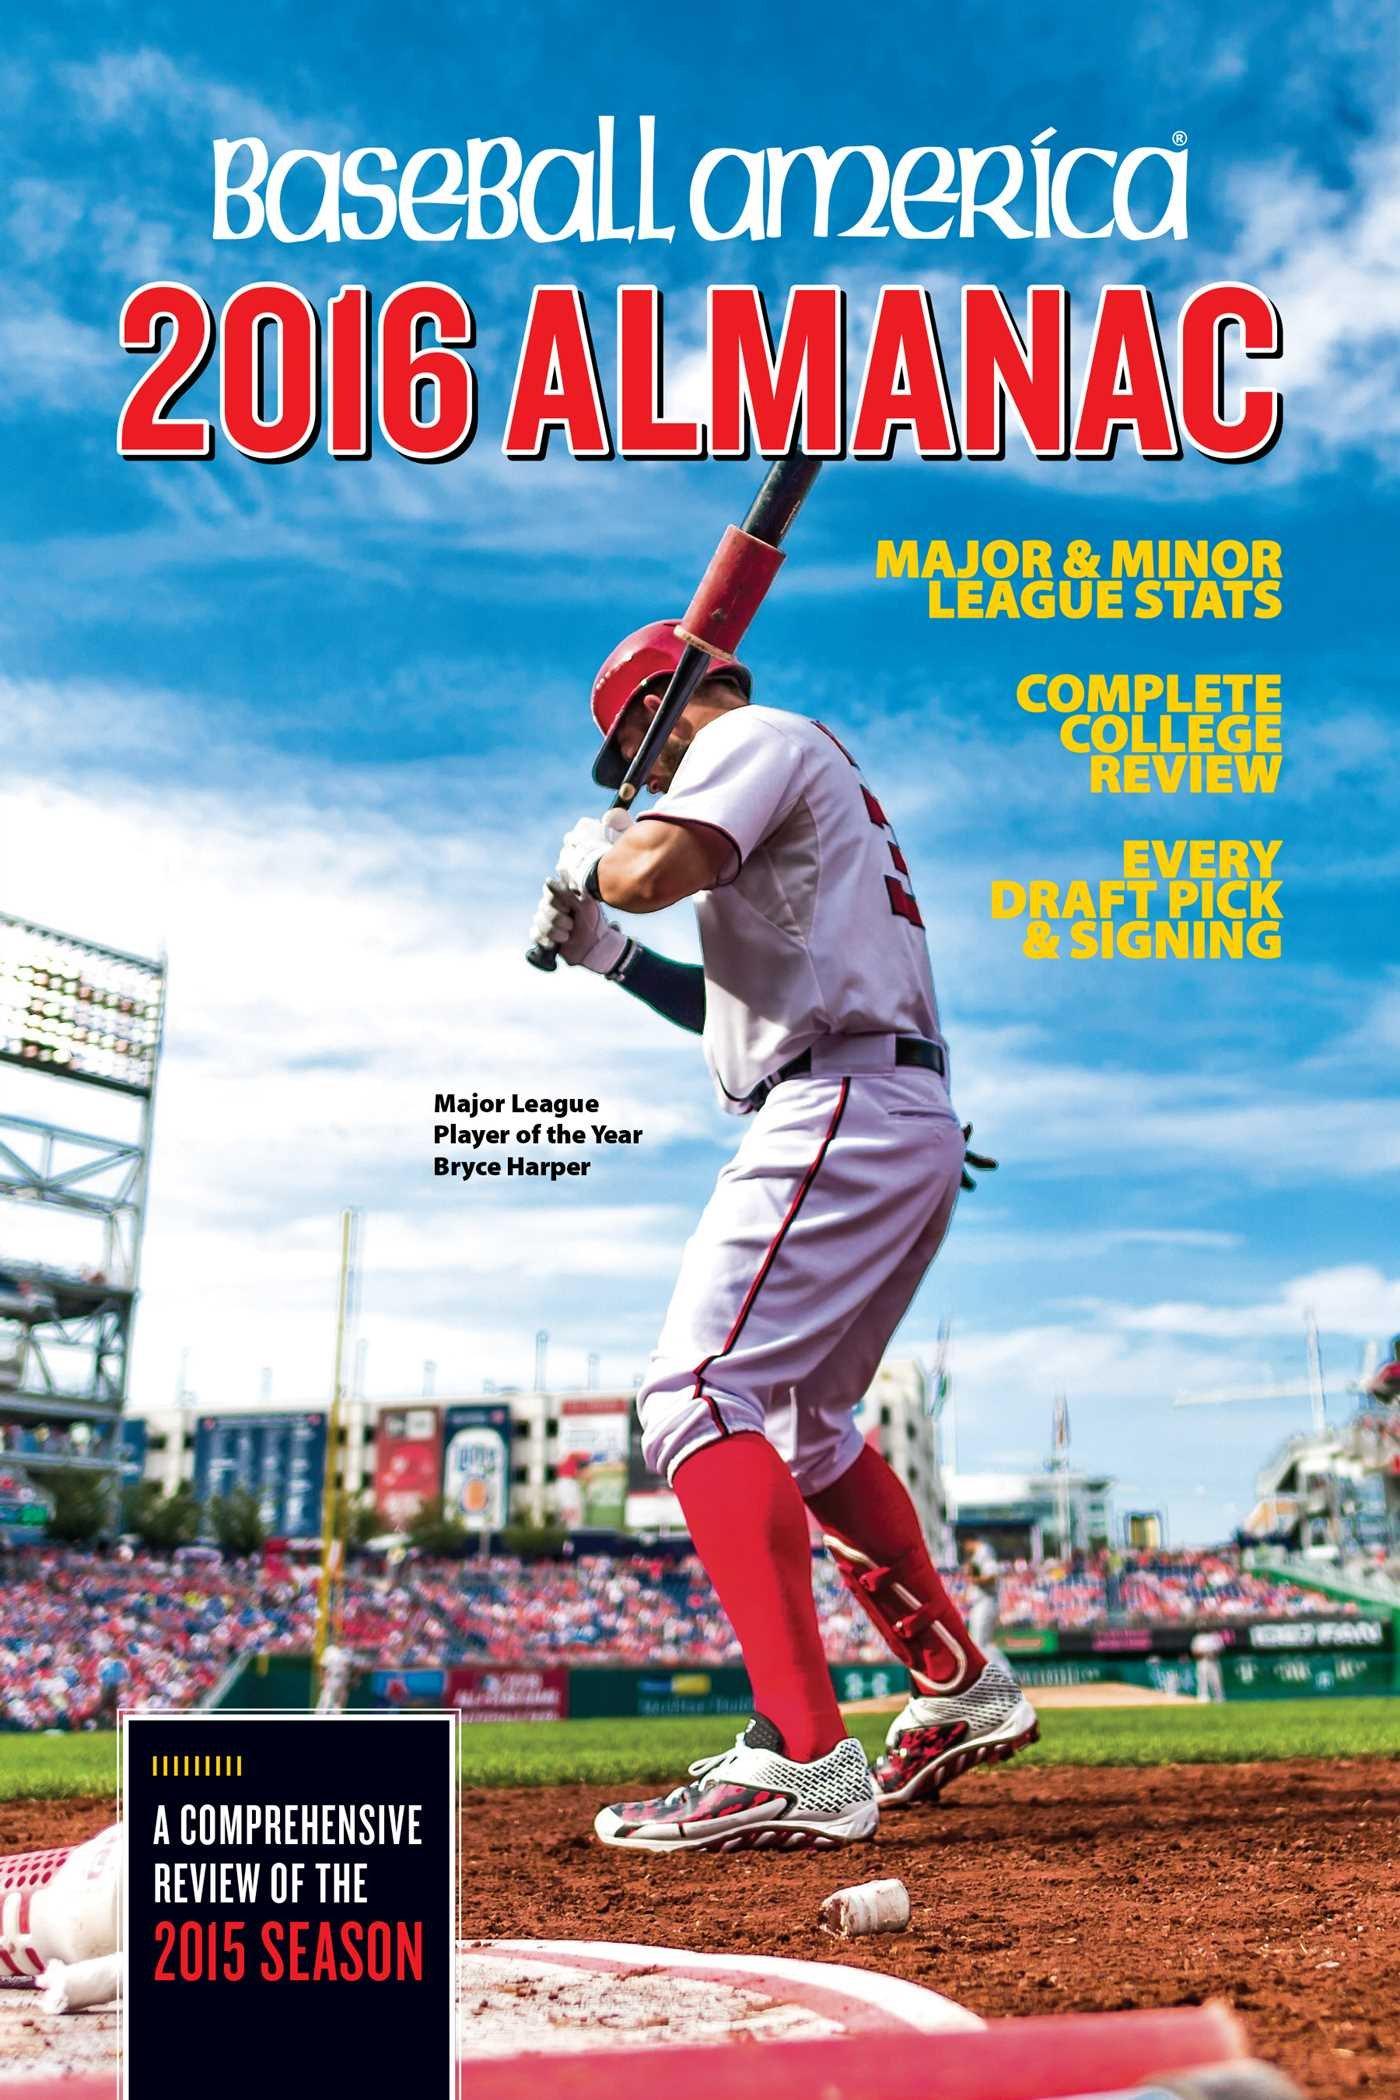 Baseball America 2016 Almanac Comprehensive product image